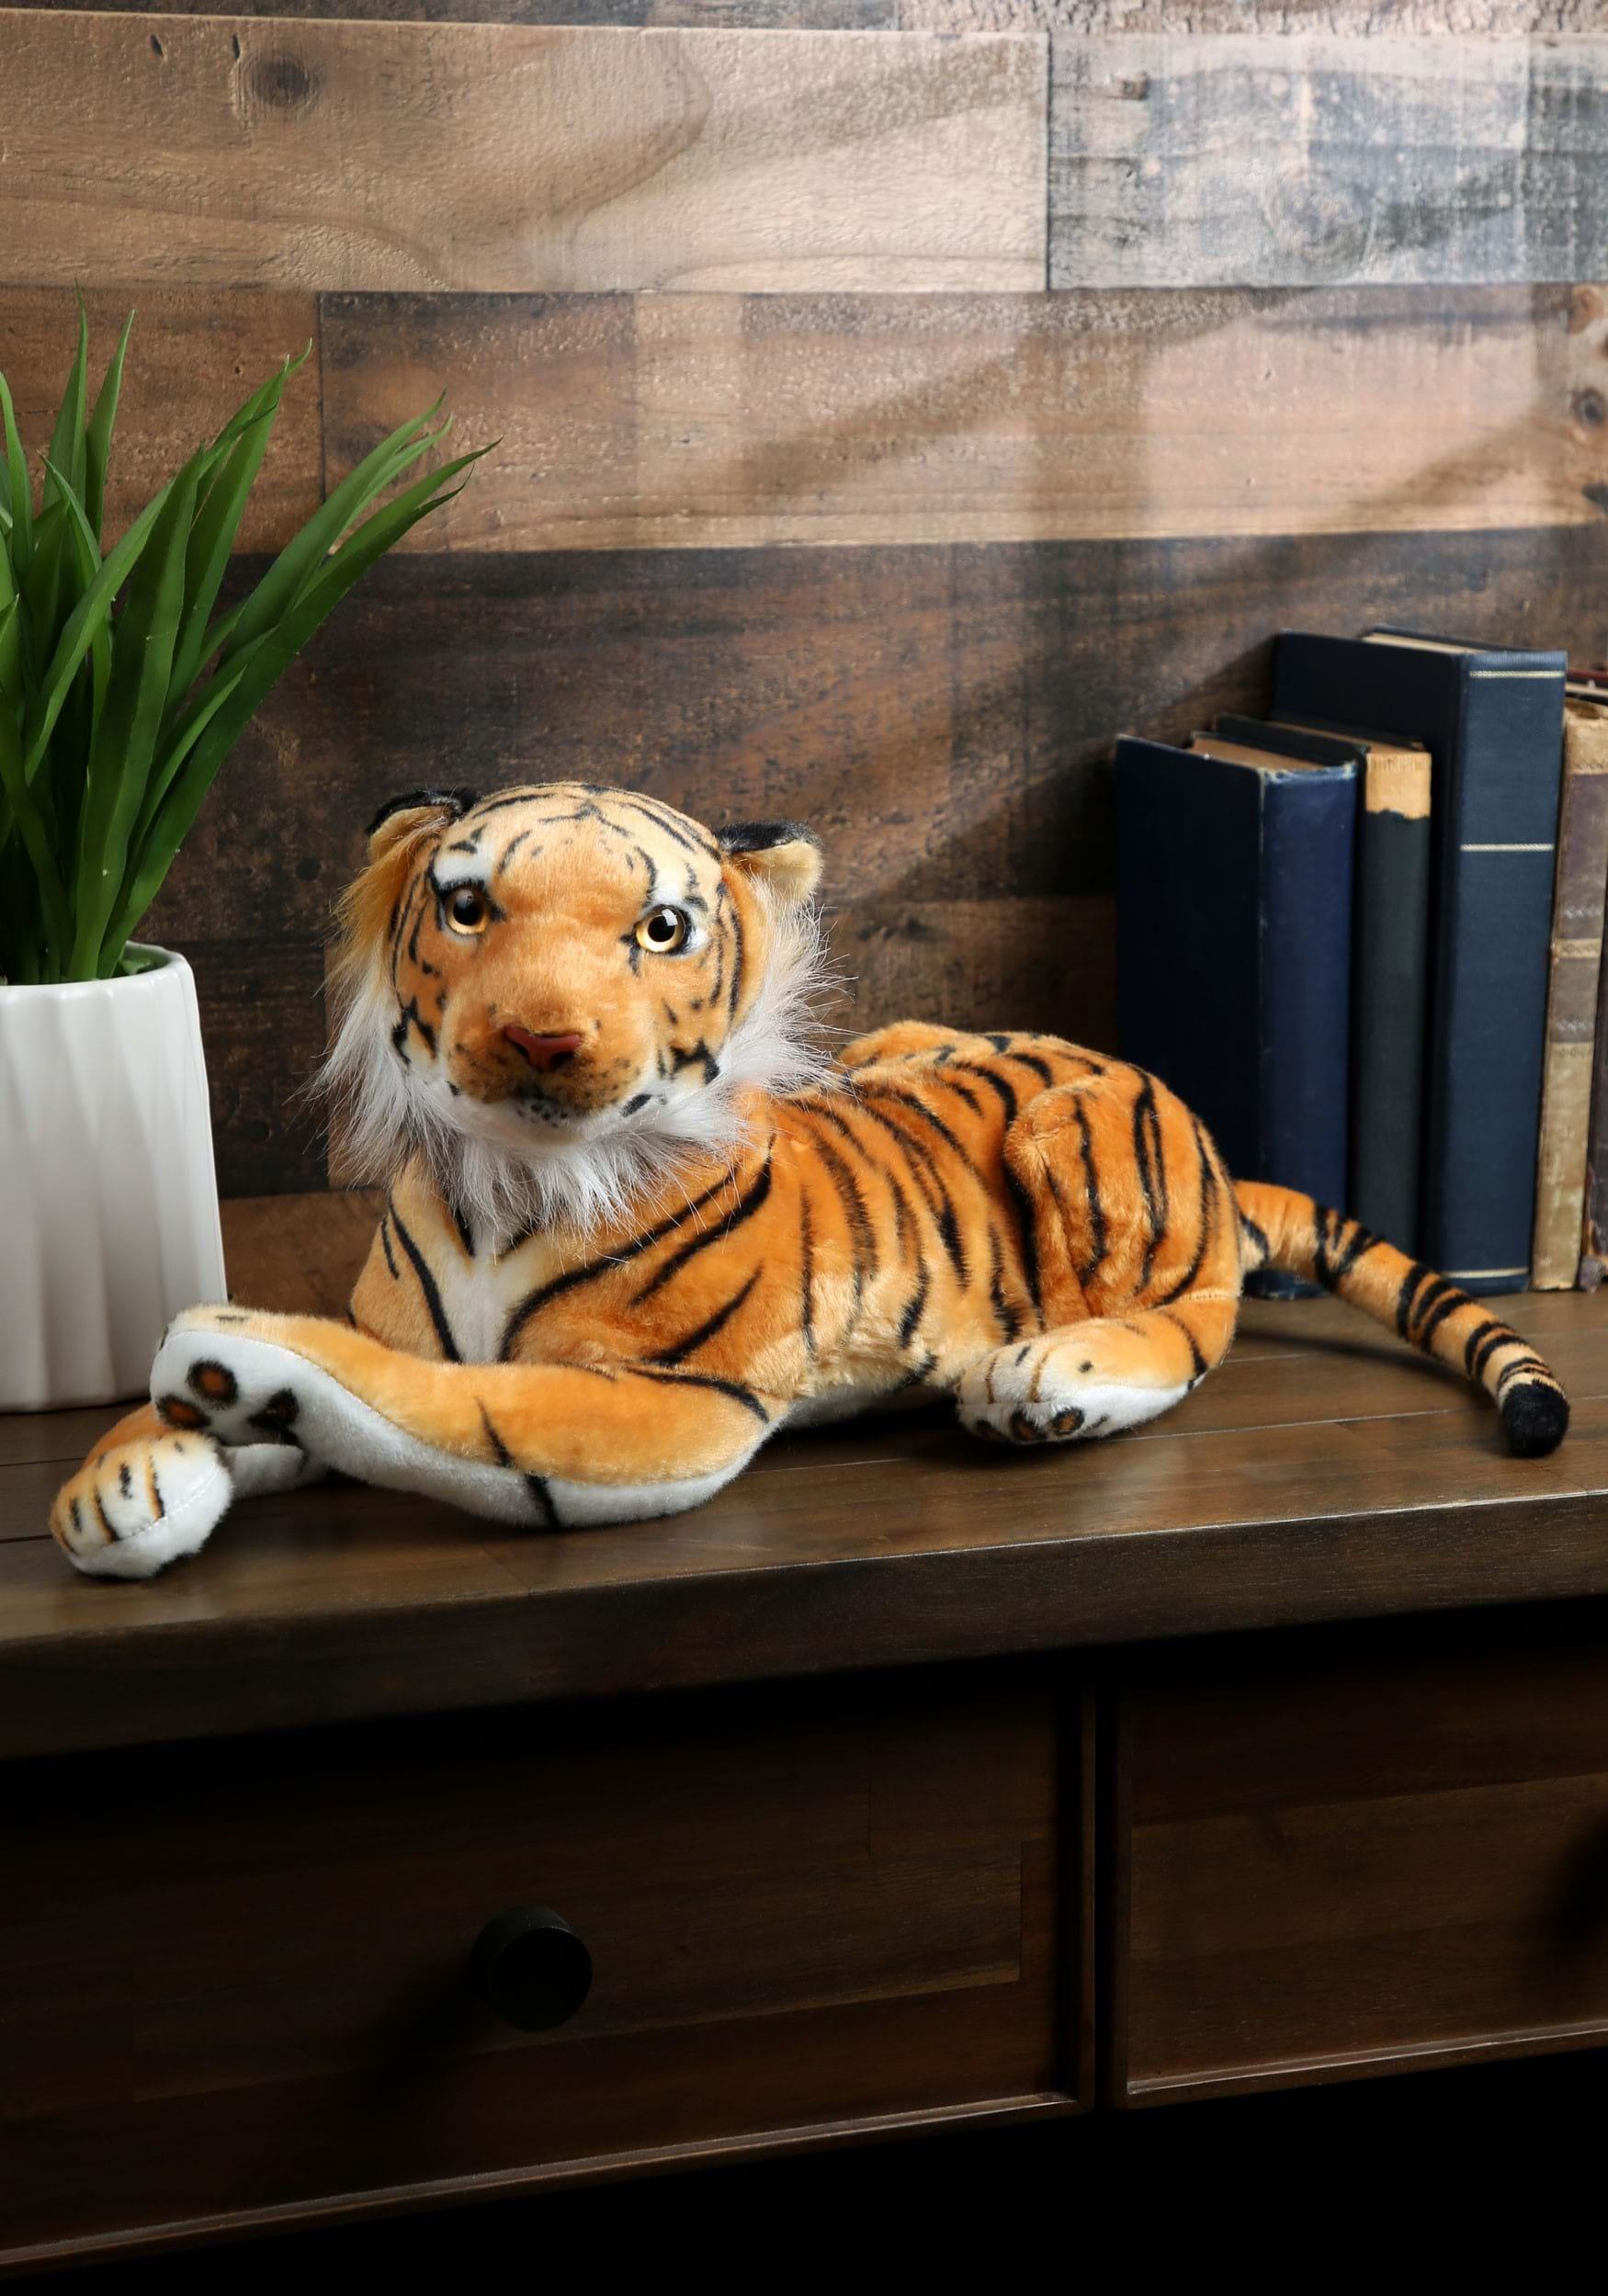 Arrow the Tiger Stuffed Animal